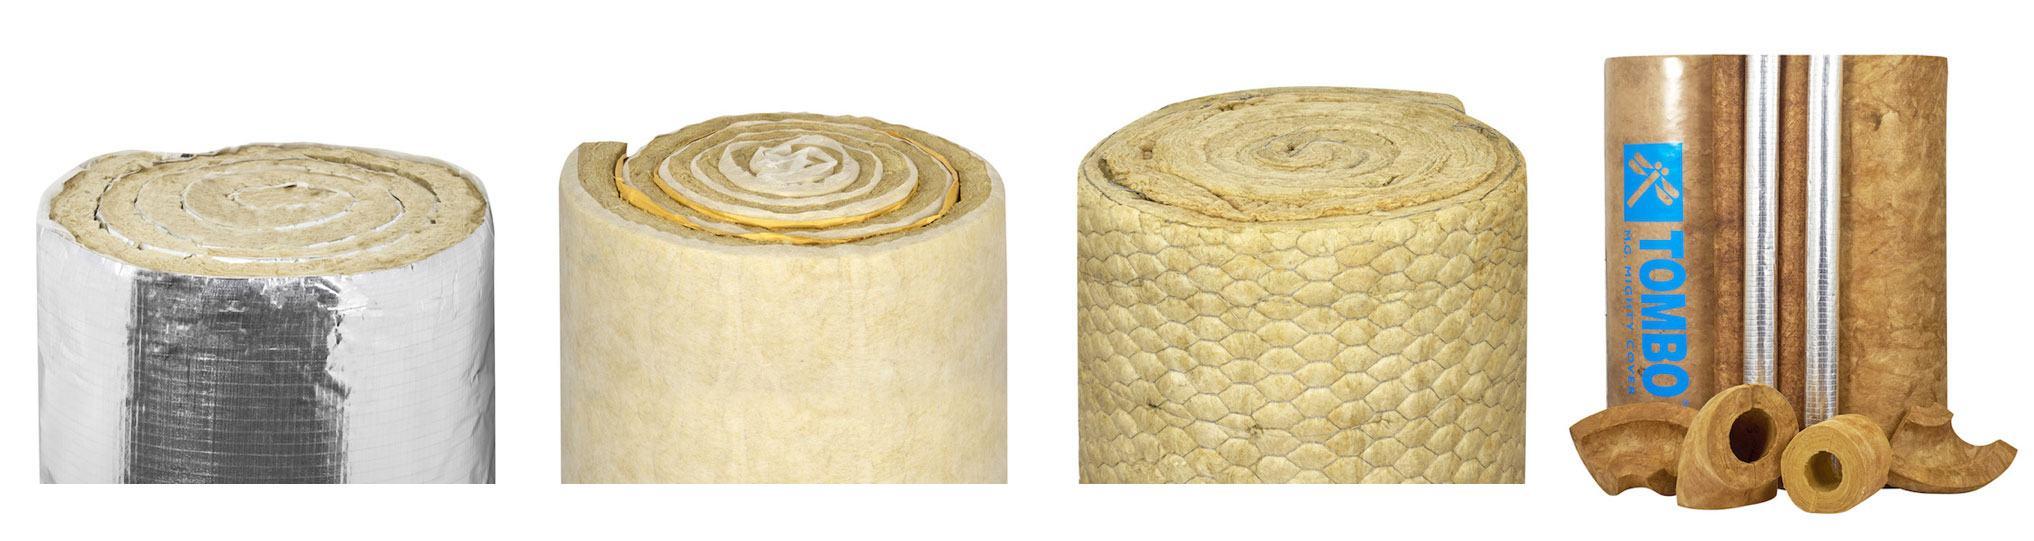 Rockwool Insulation Australia